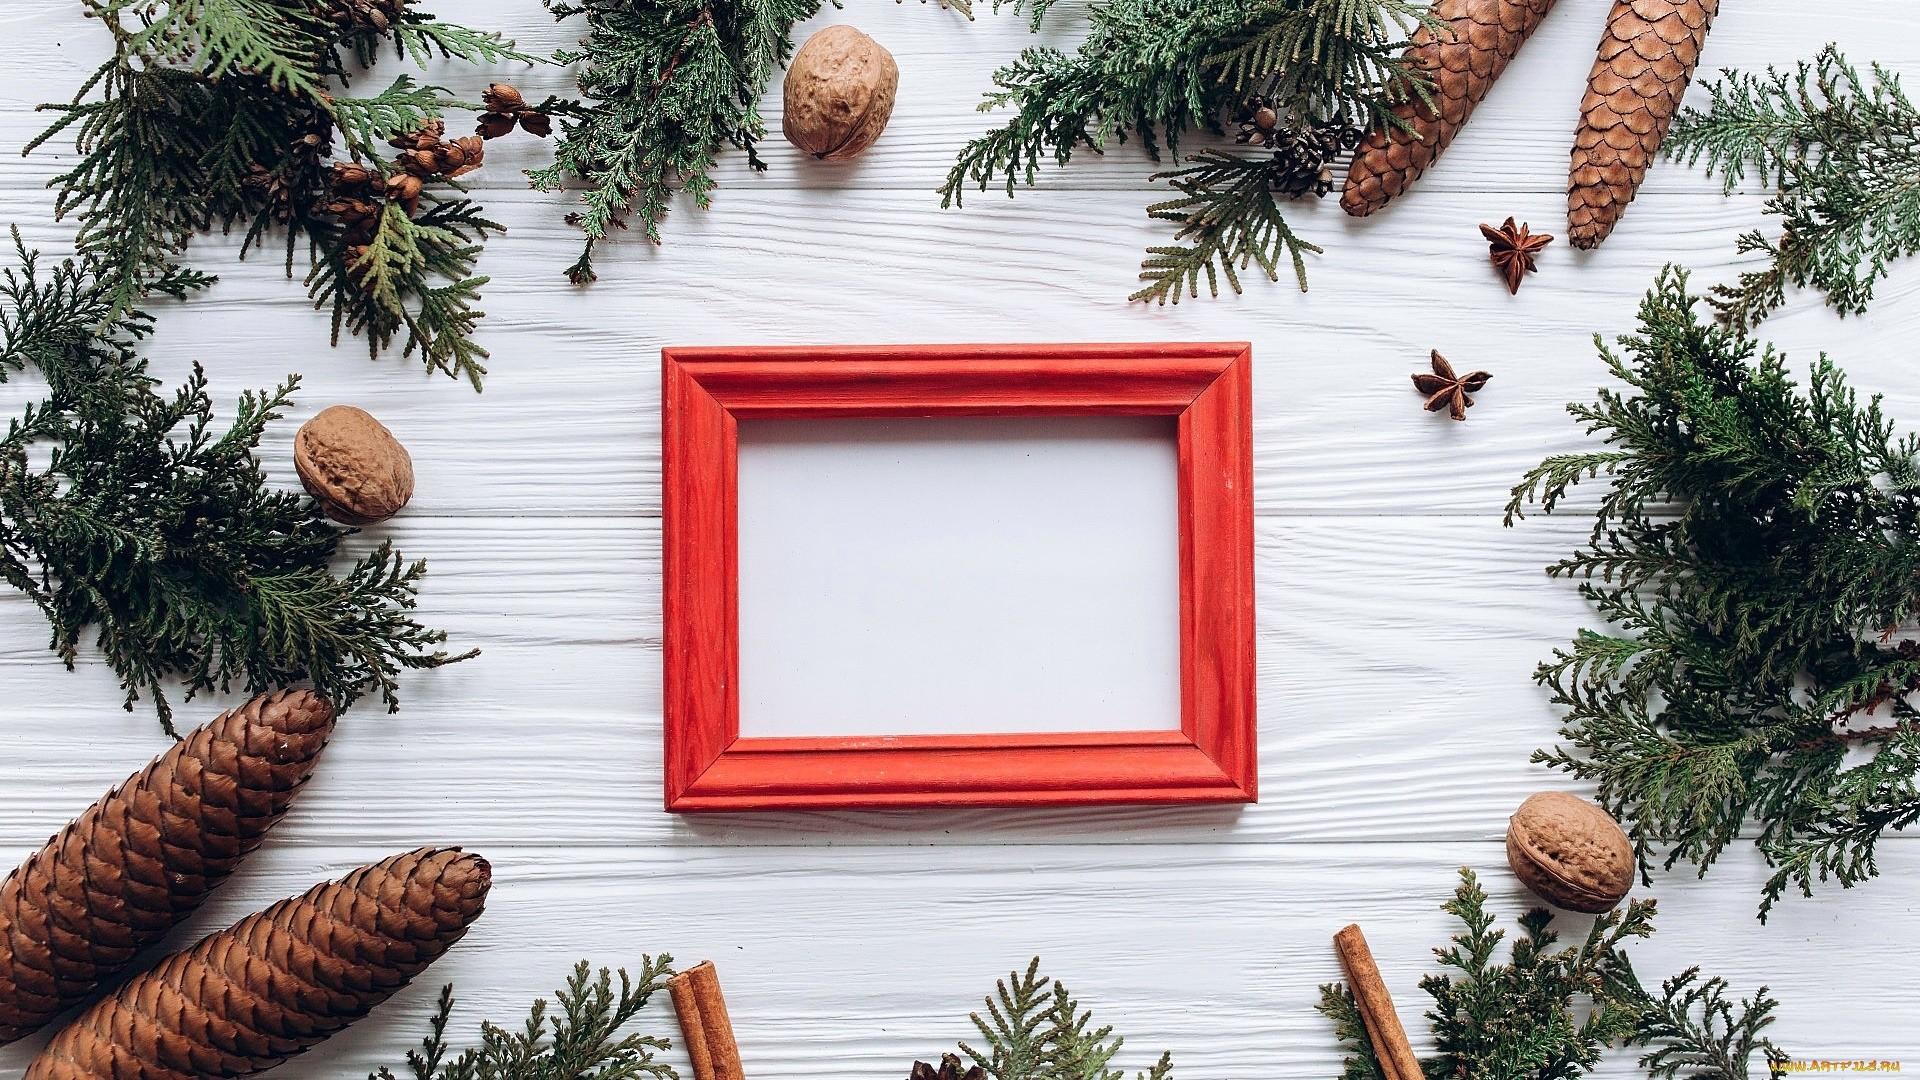 New Year Branch Frame Desktop Wallpaper